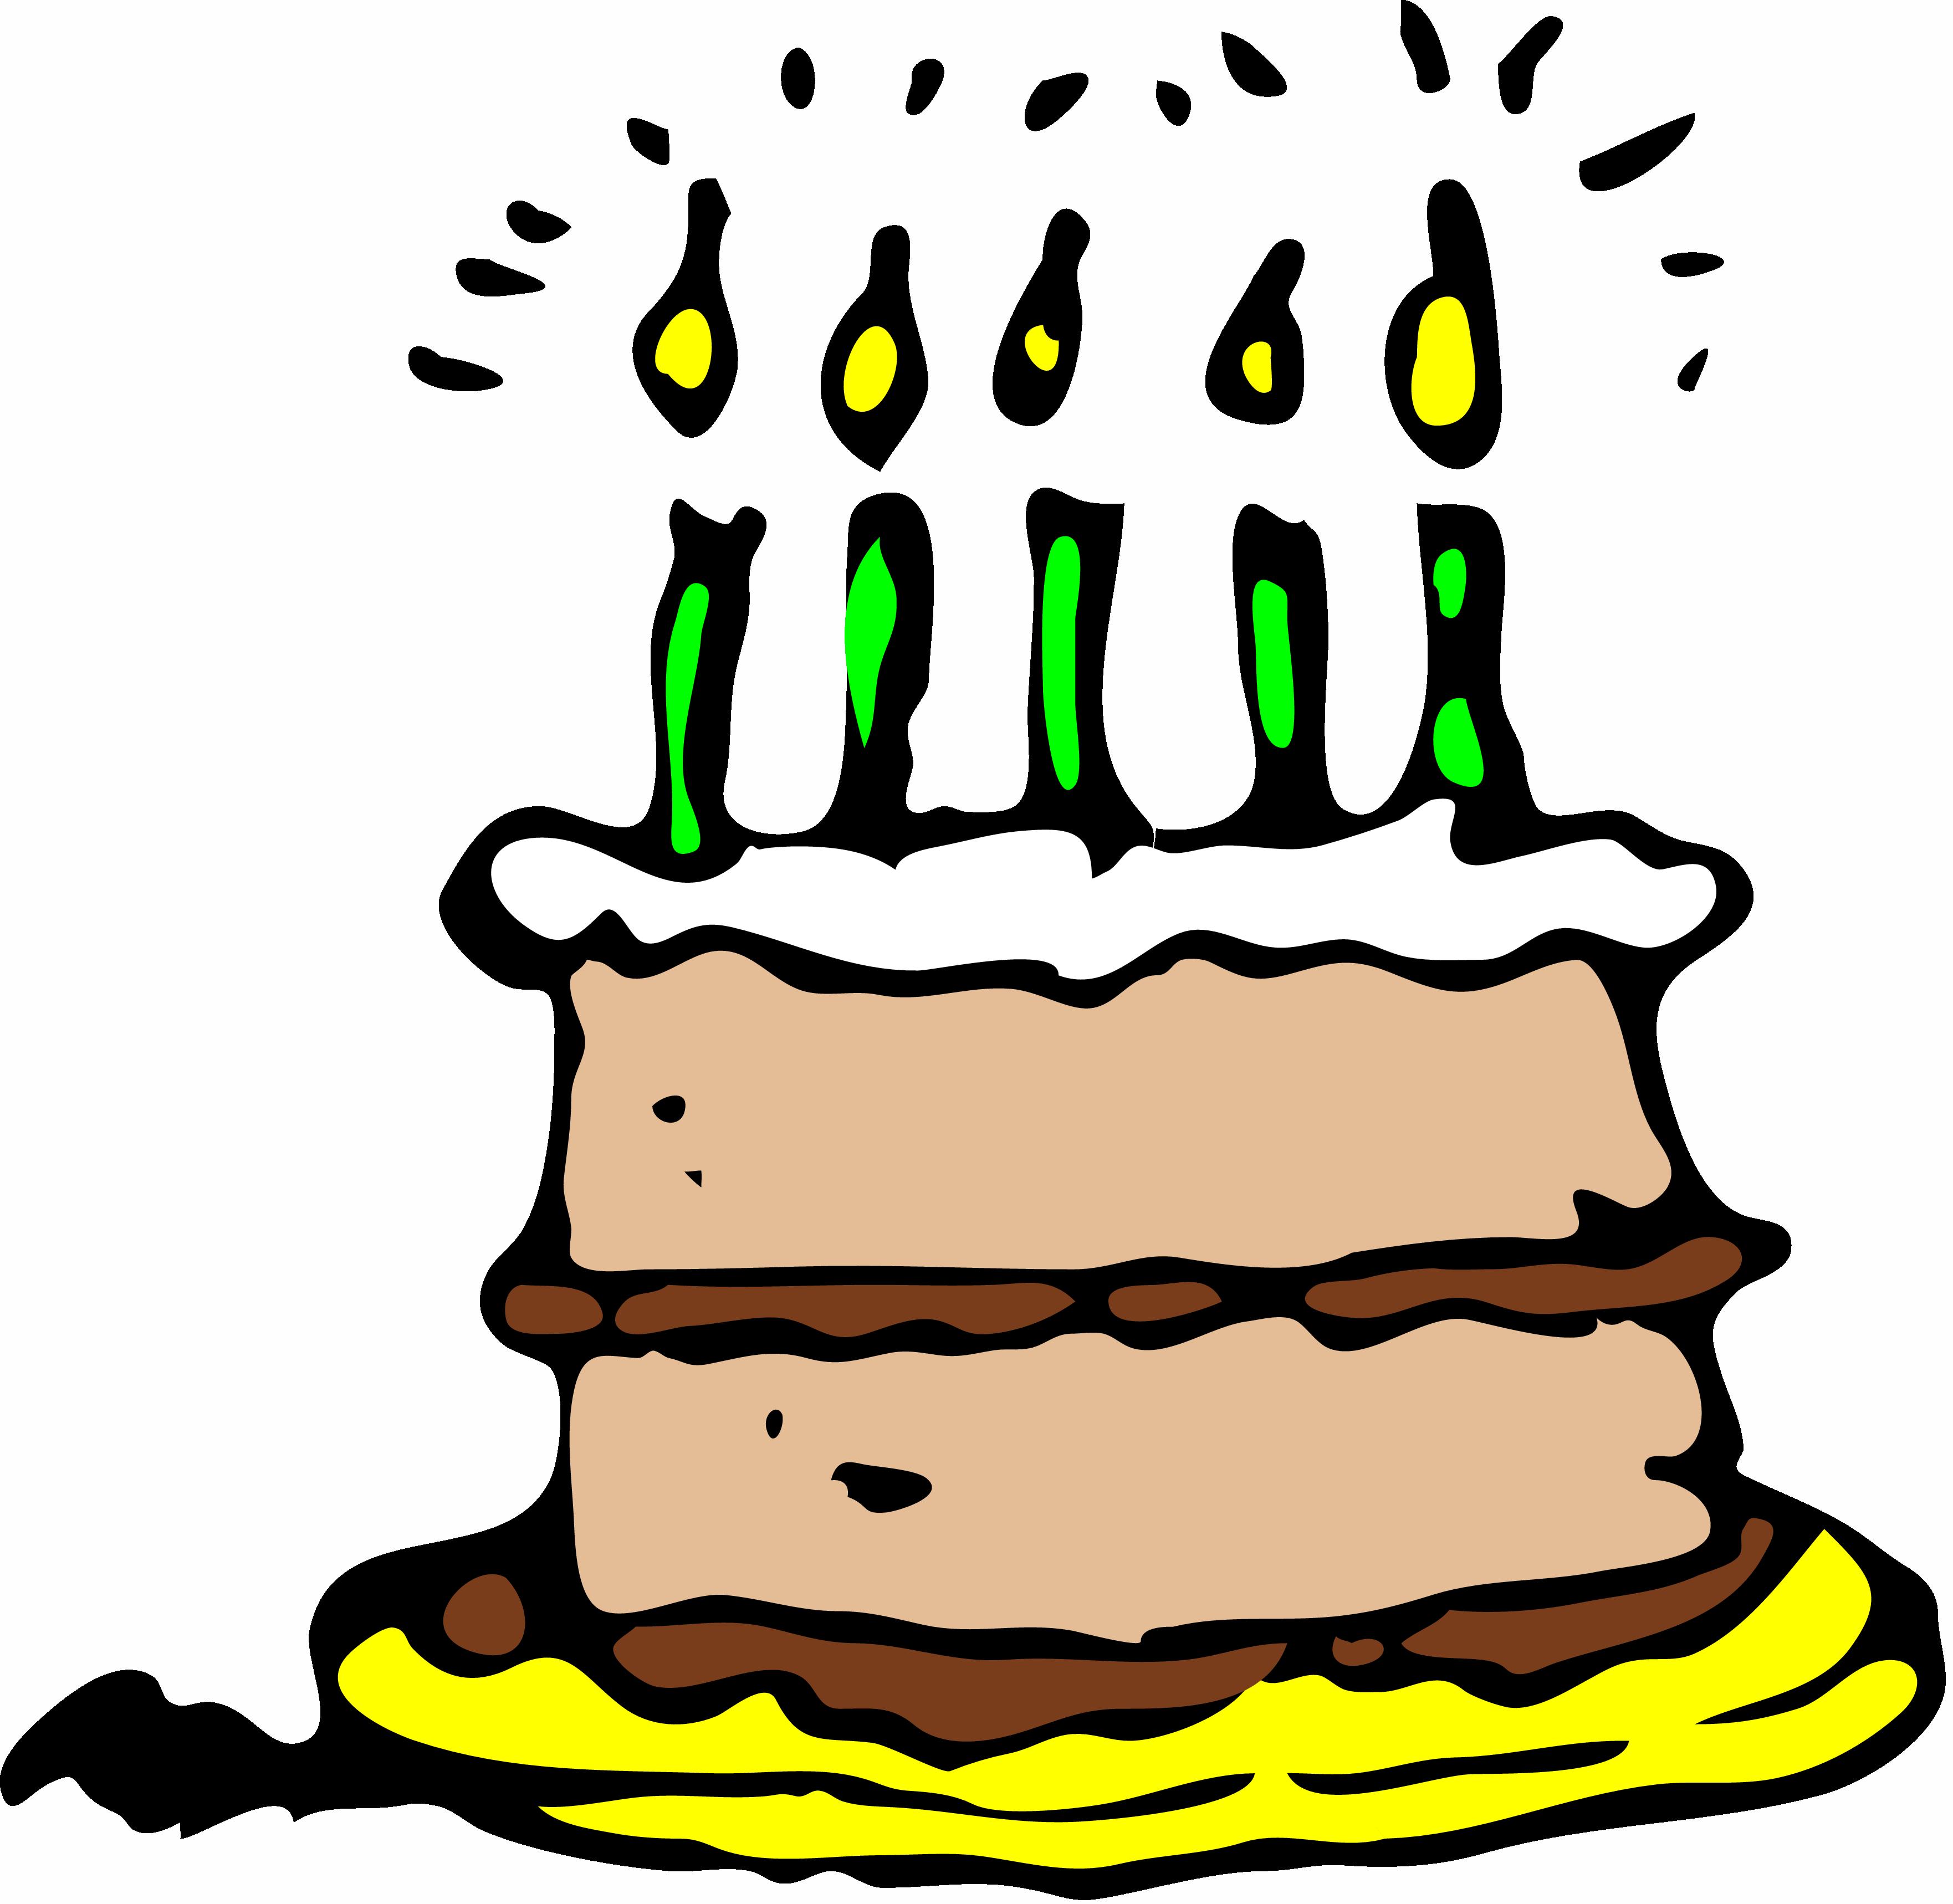 Free Cake Images Free, Download Free Clip Art, Free Clip Art.